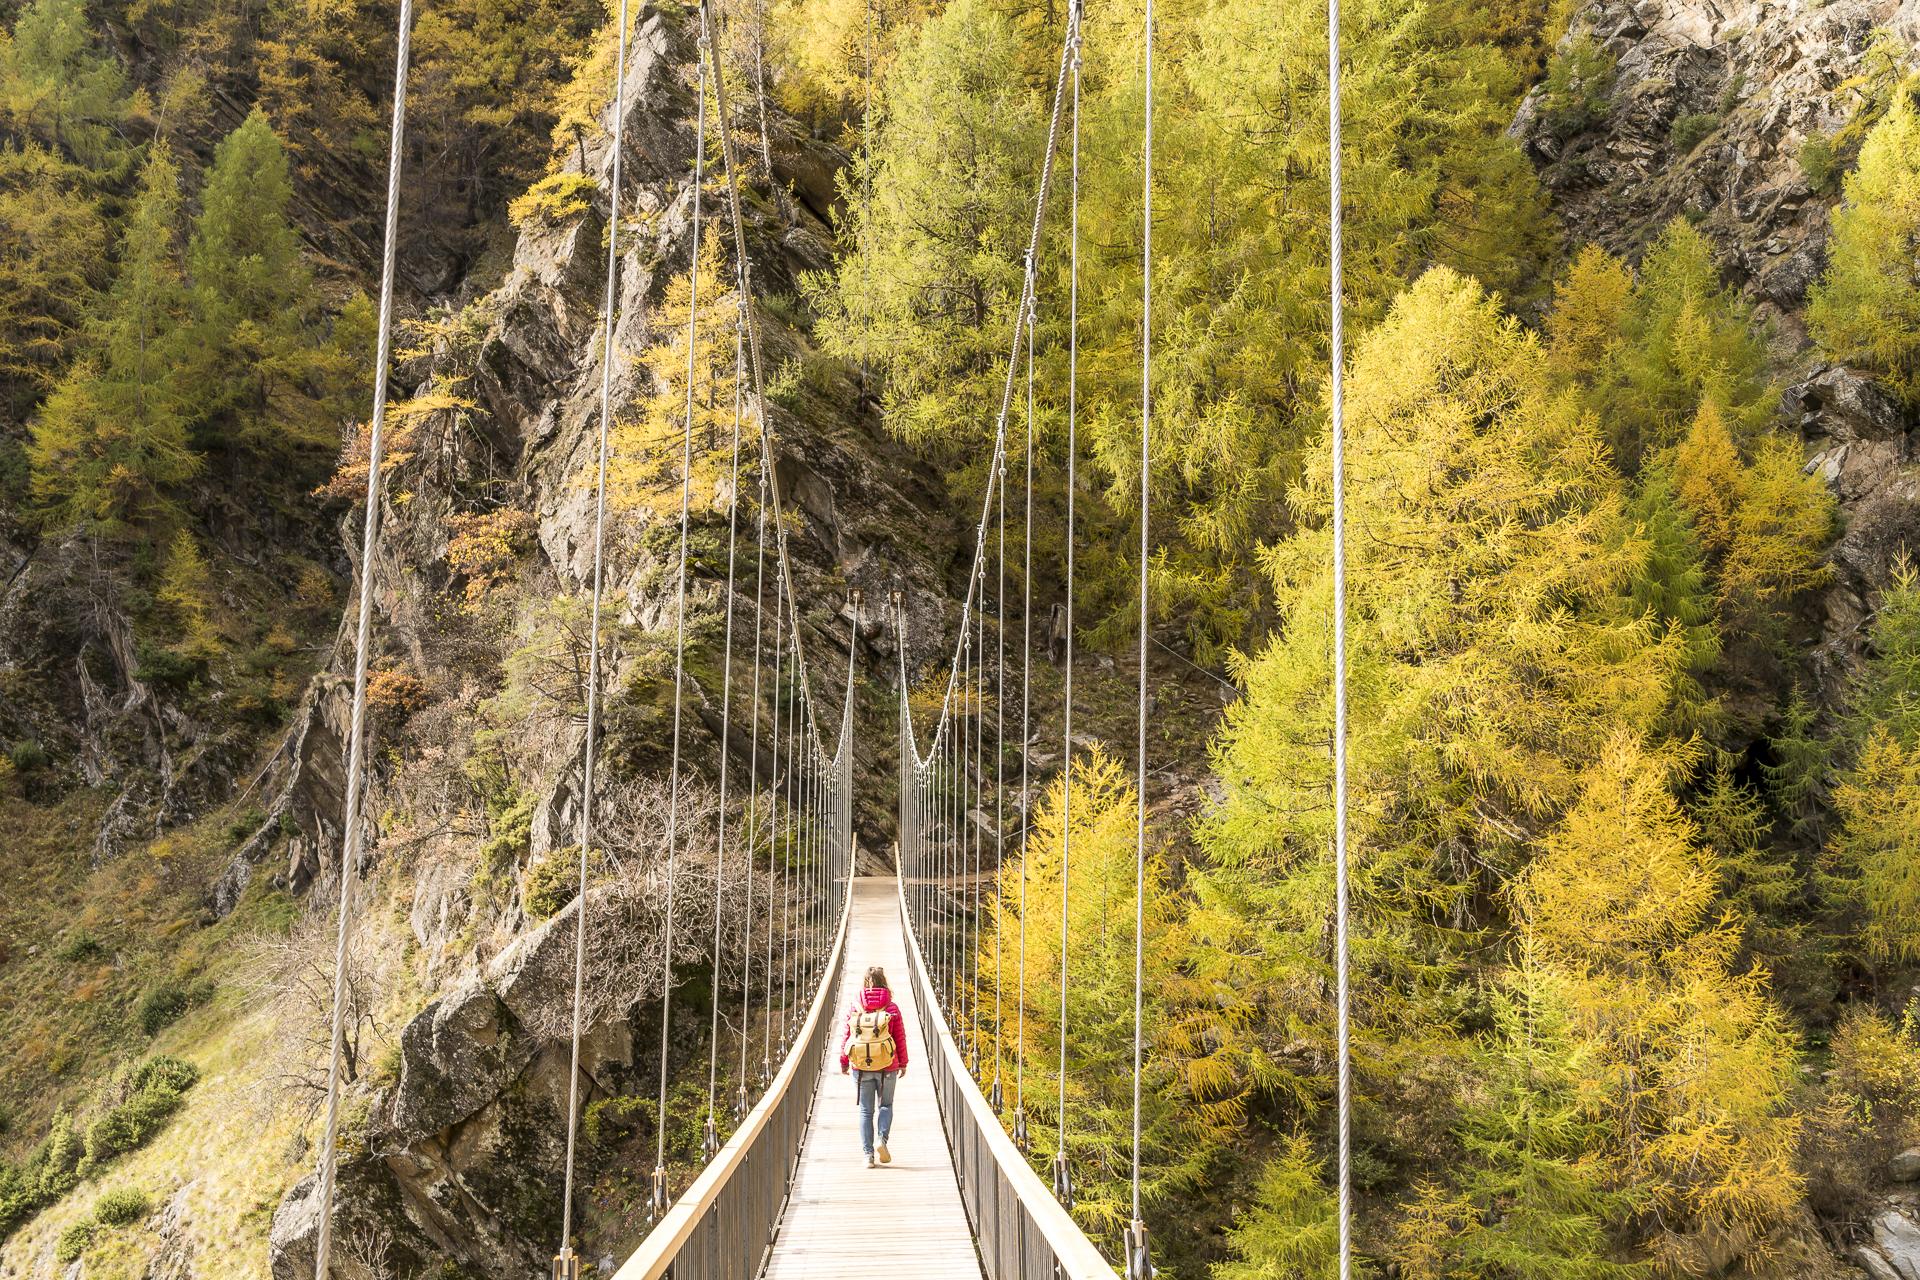 Meraner Höhenweg Hängebrücke